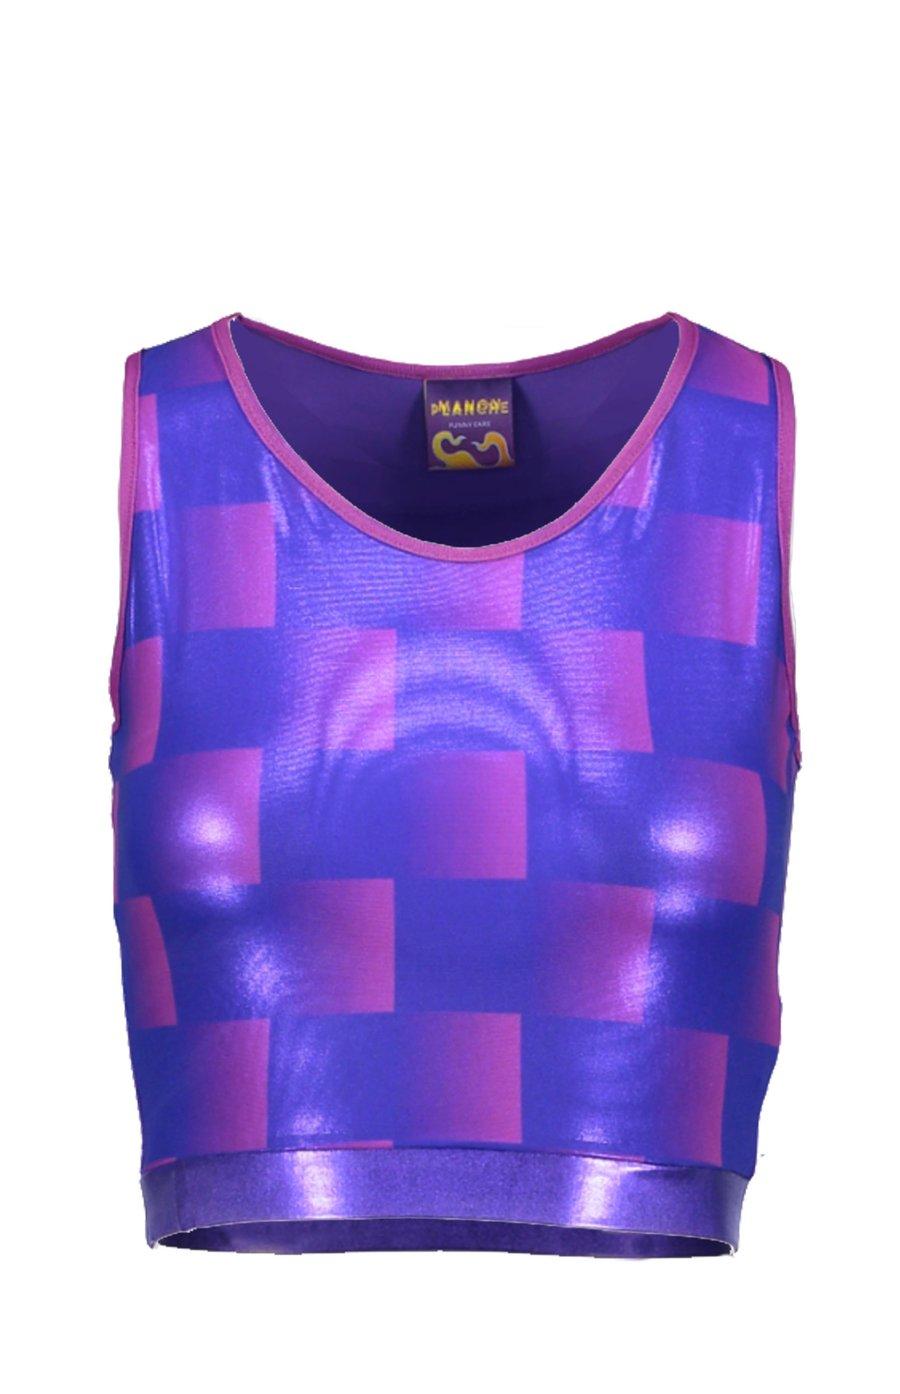 Image of Purple Check Sportsbra